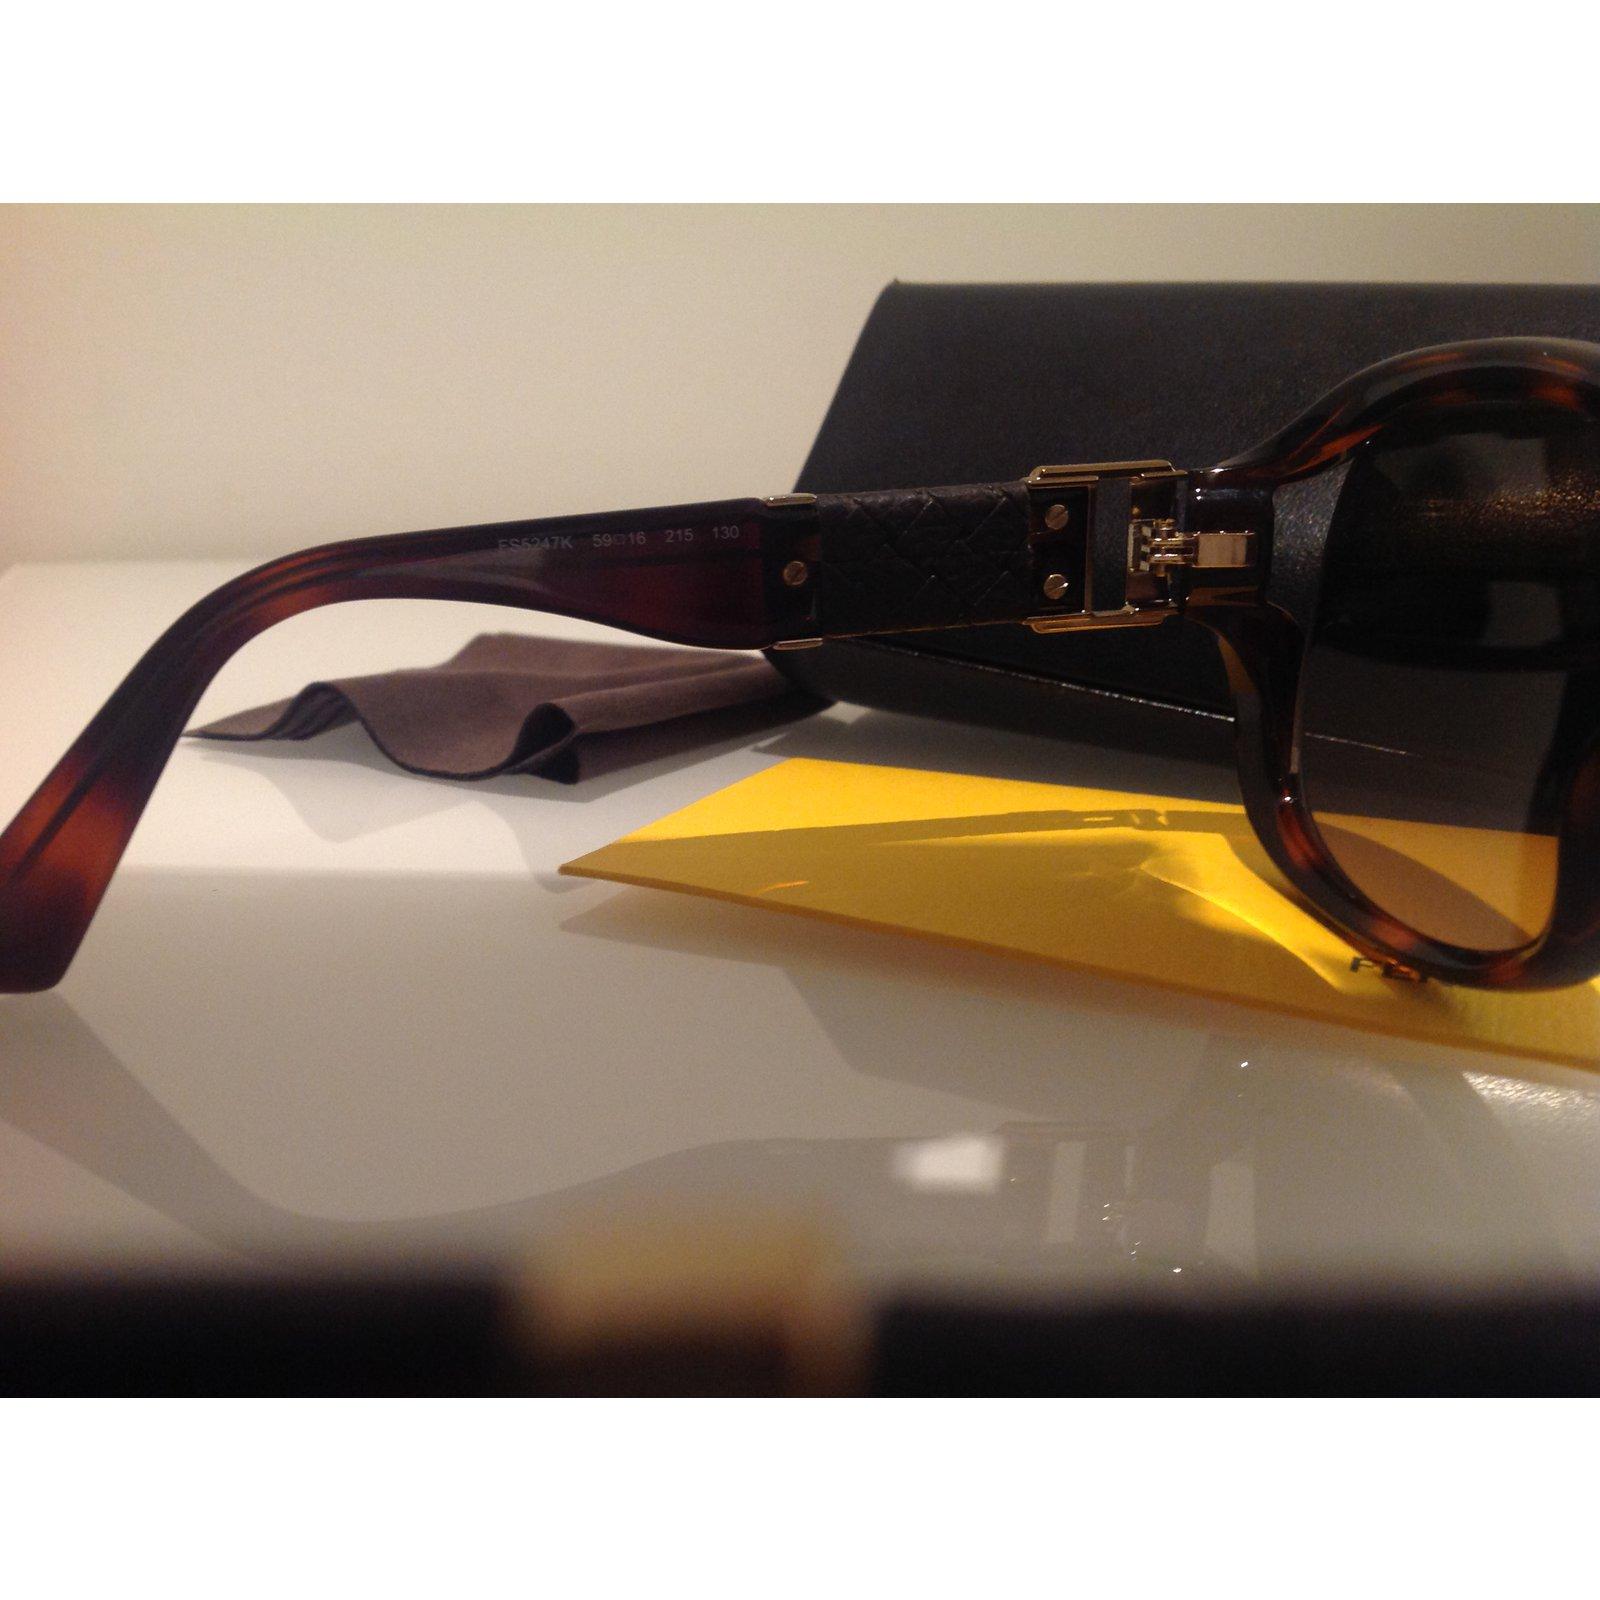 e37547f12d Facebook · Pin This. Fendi Sunglasses Sunglasses Plastic Brown ...